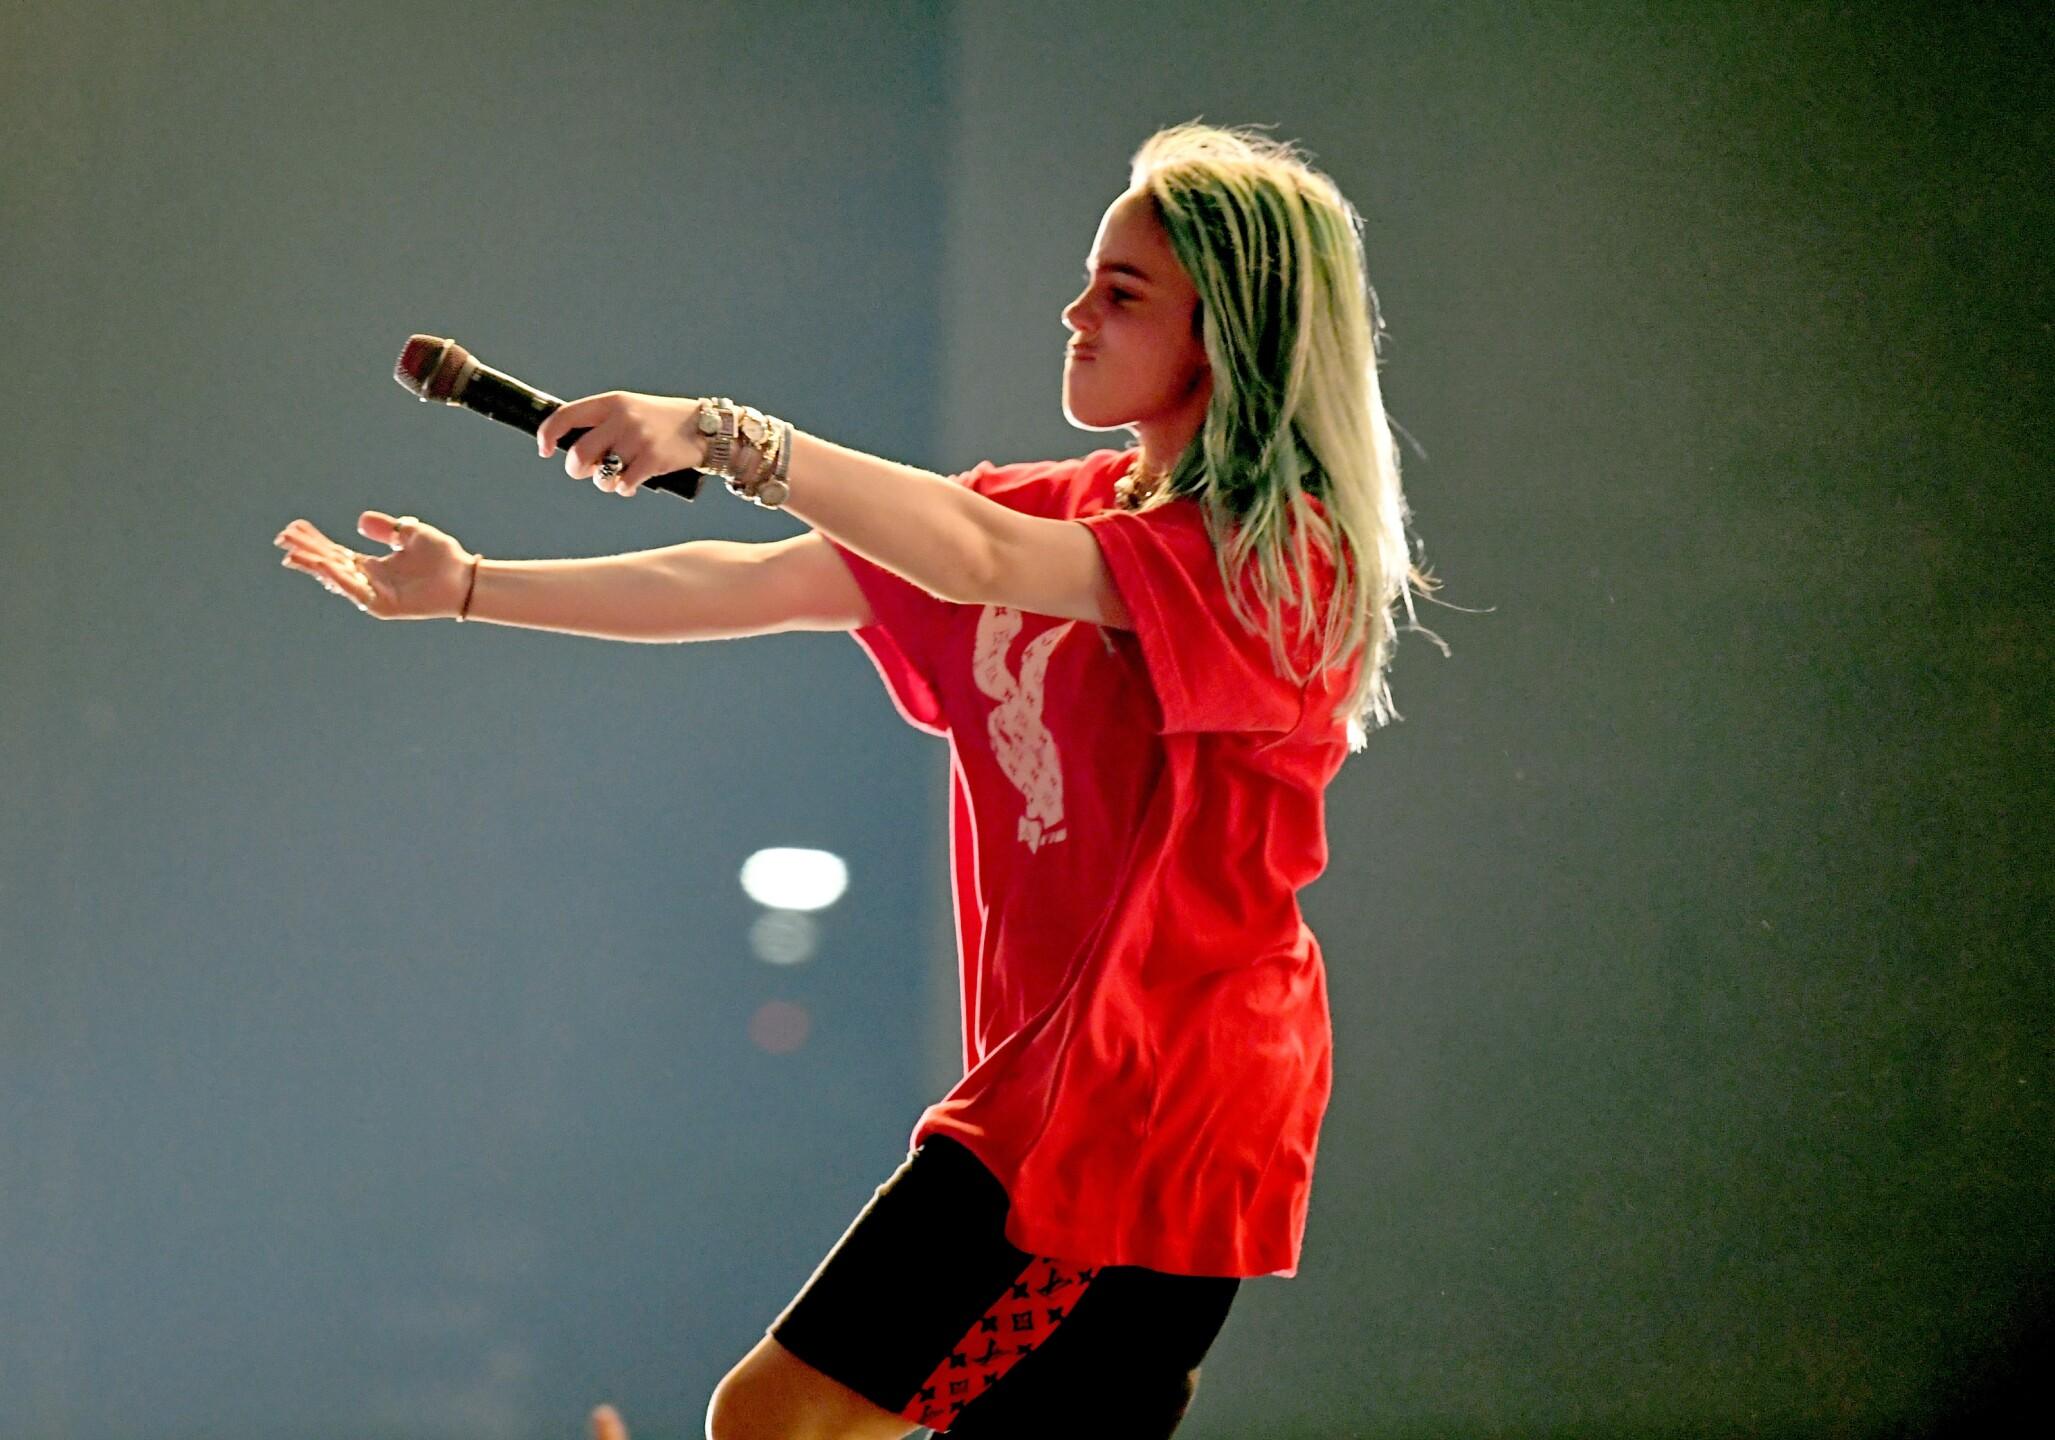 Billie Eilish to perform July 6 at Summerfest